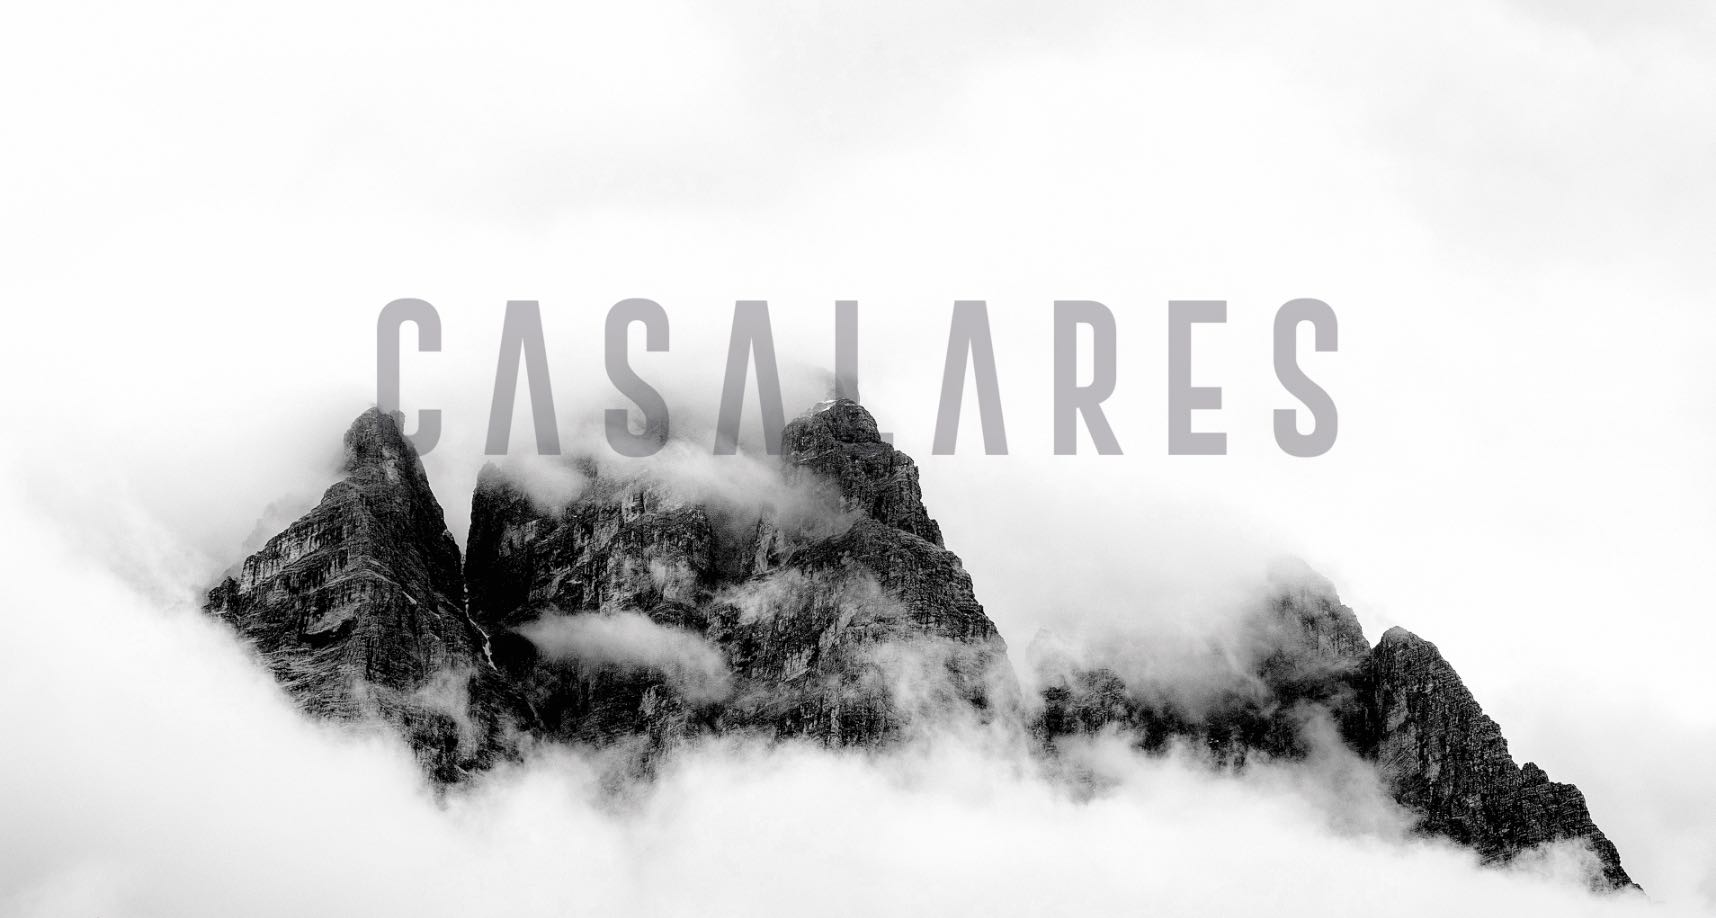 Cortina Casalares